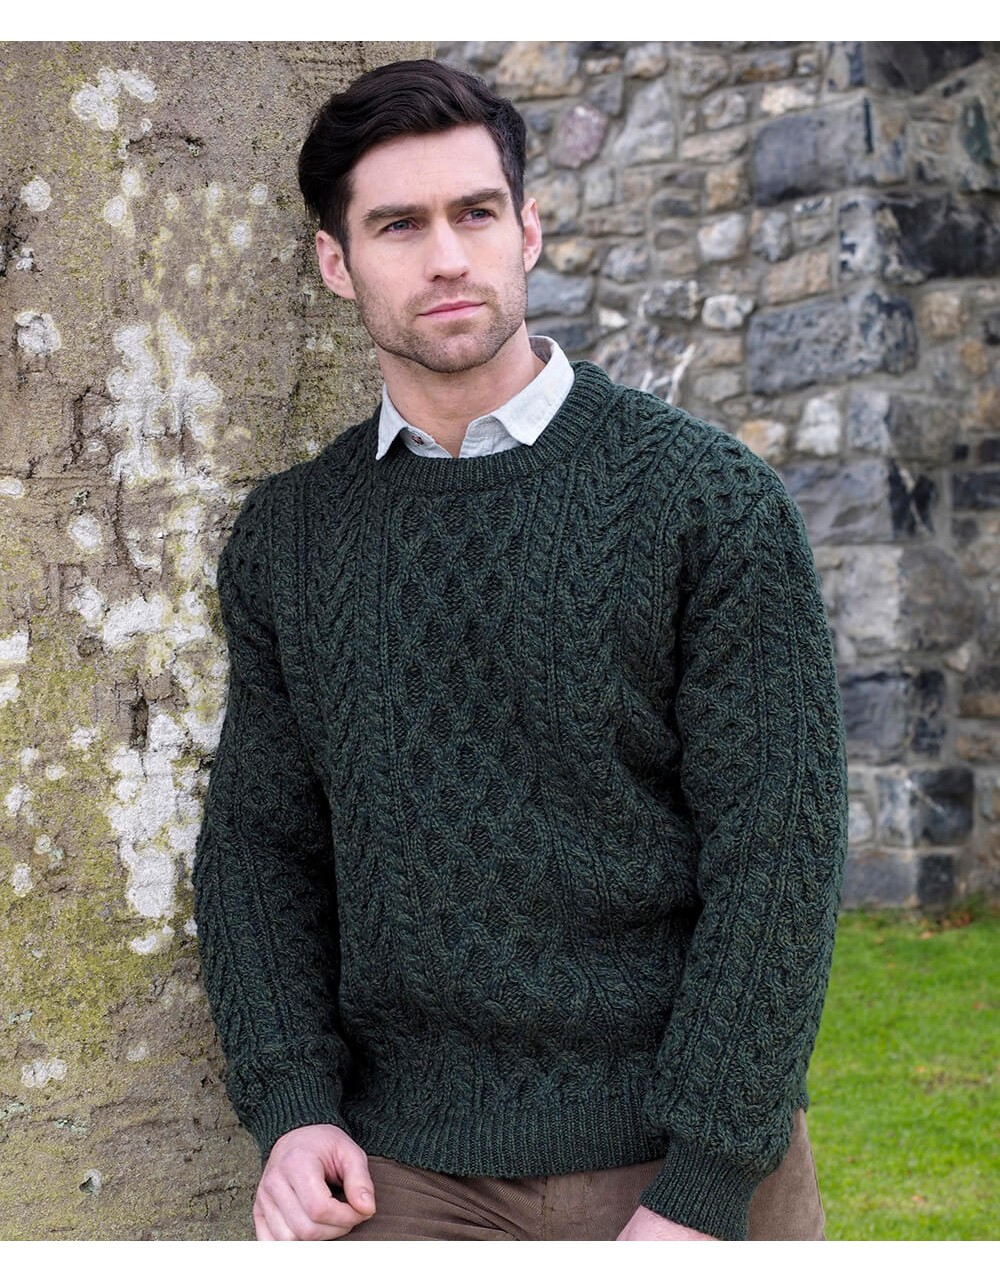 Sweater Heavy Aran Fisherman Crew Neck|Aran Sweaters Men|Irish Handcrafts